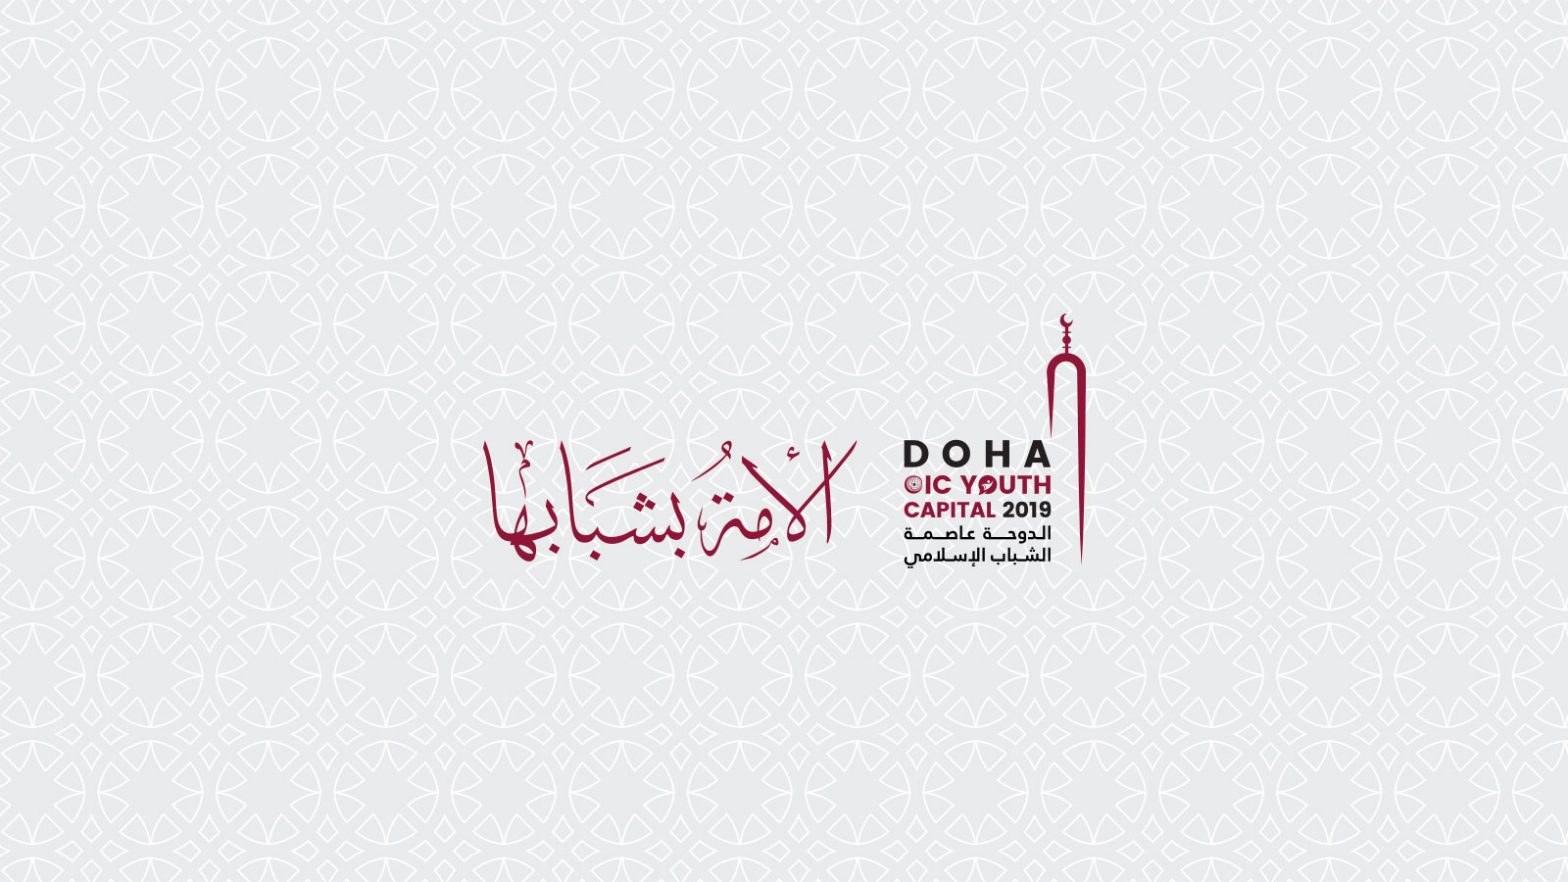 Doha Youth Camp for Voluntary and Humanitarian Work, Qatar